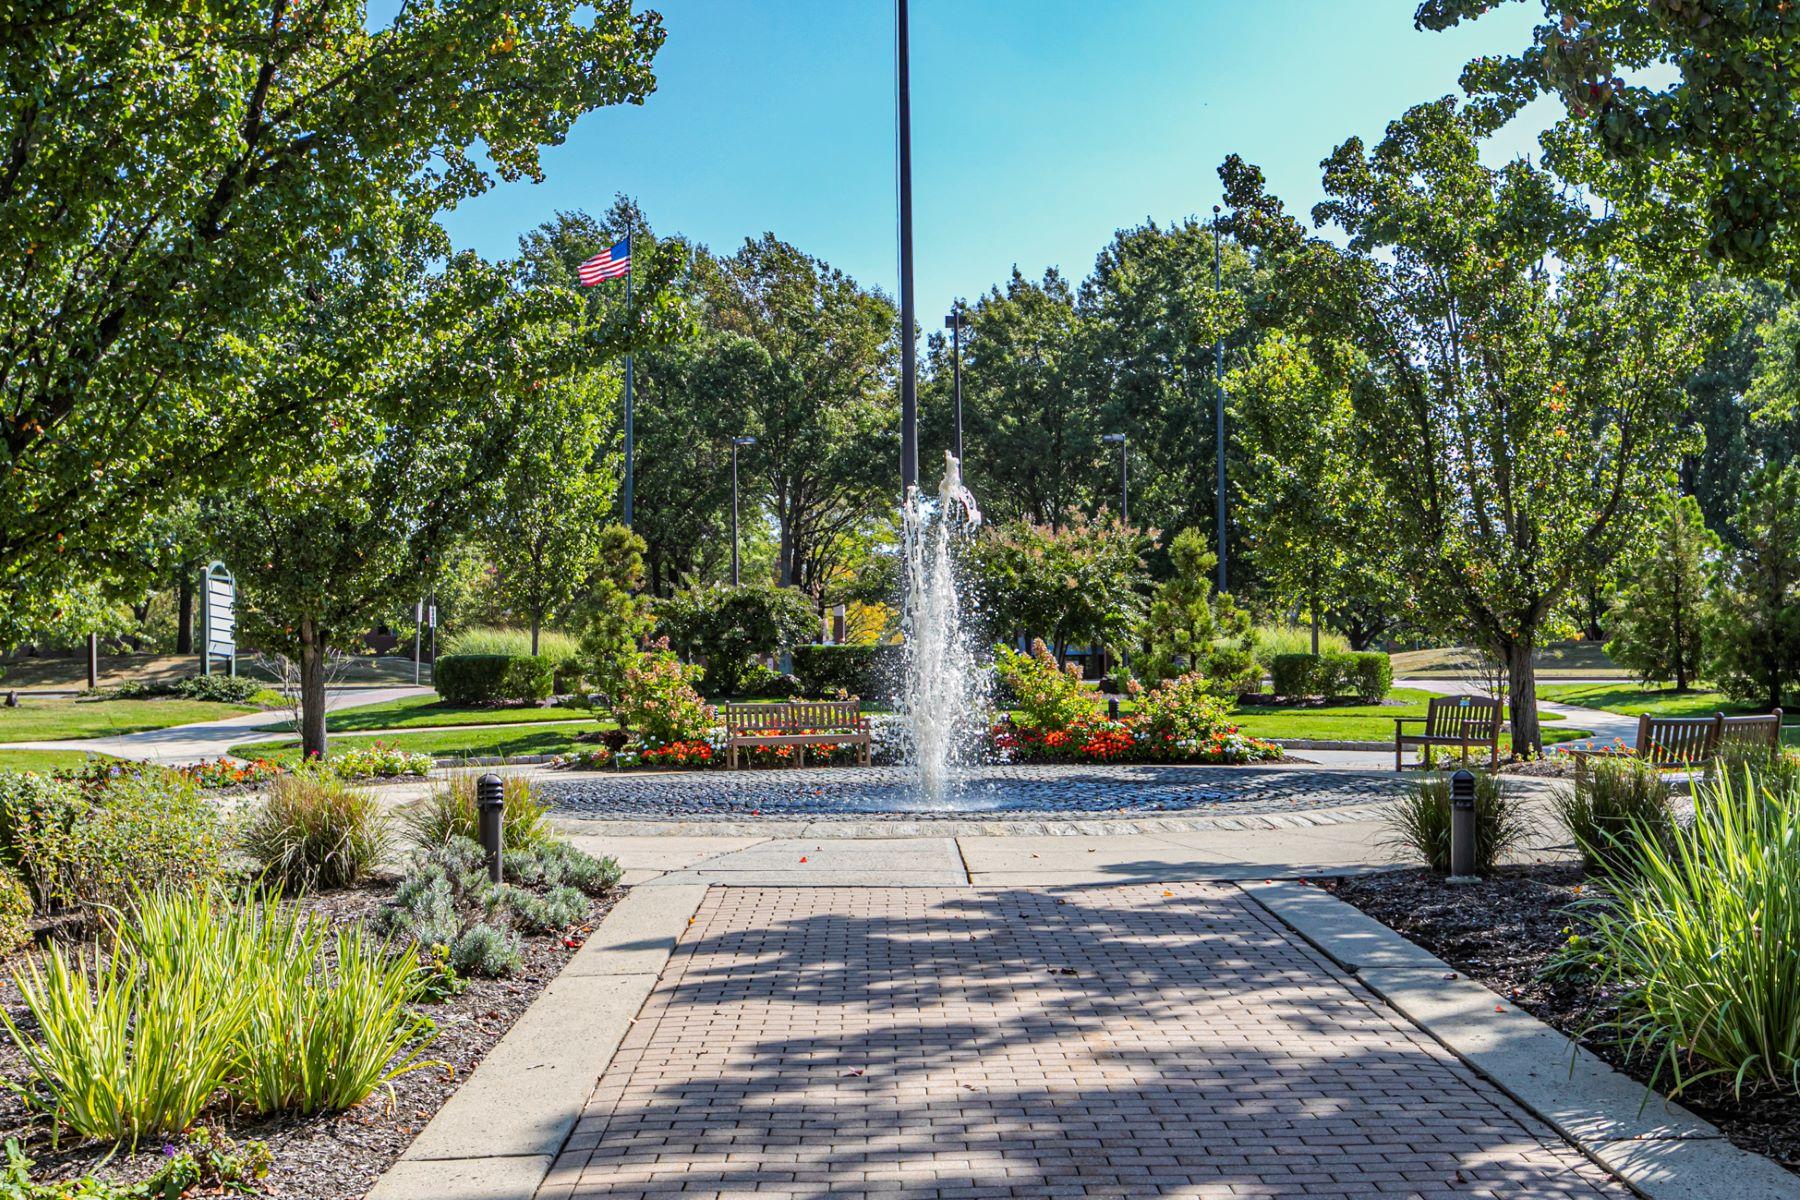 Apartments 용 매매 에 Natural Views & Joyful Colors Are A Delight! 2324 Windrow Drive, Princeton, 뉴저지 08540 미국